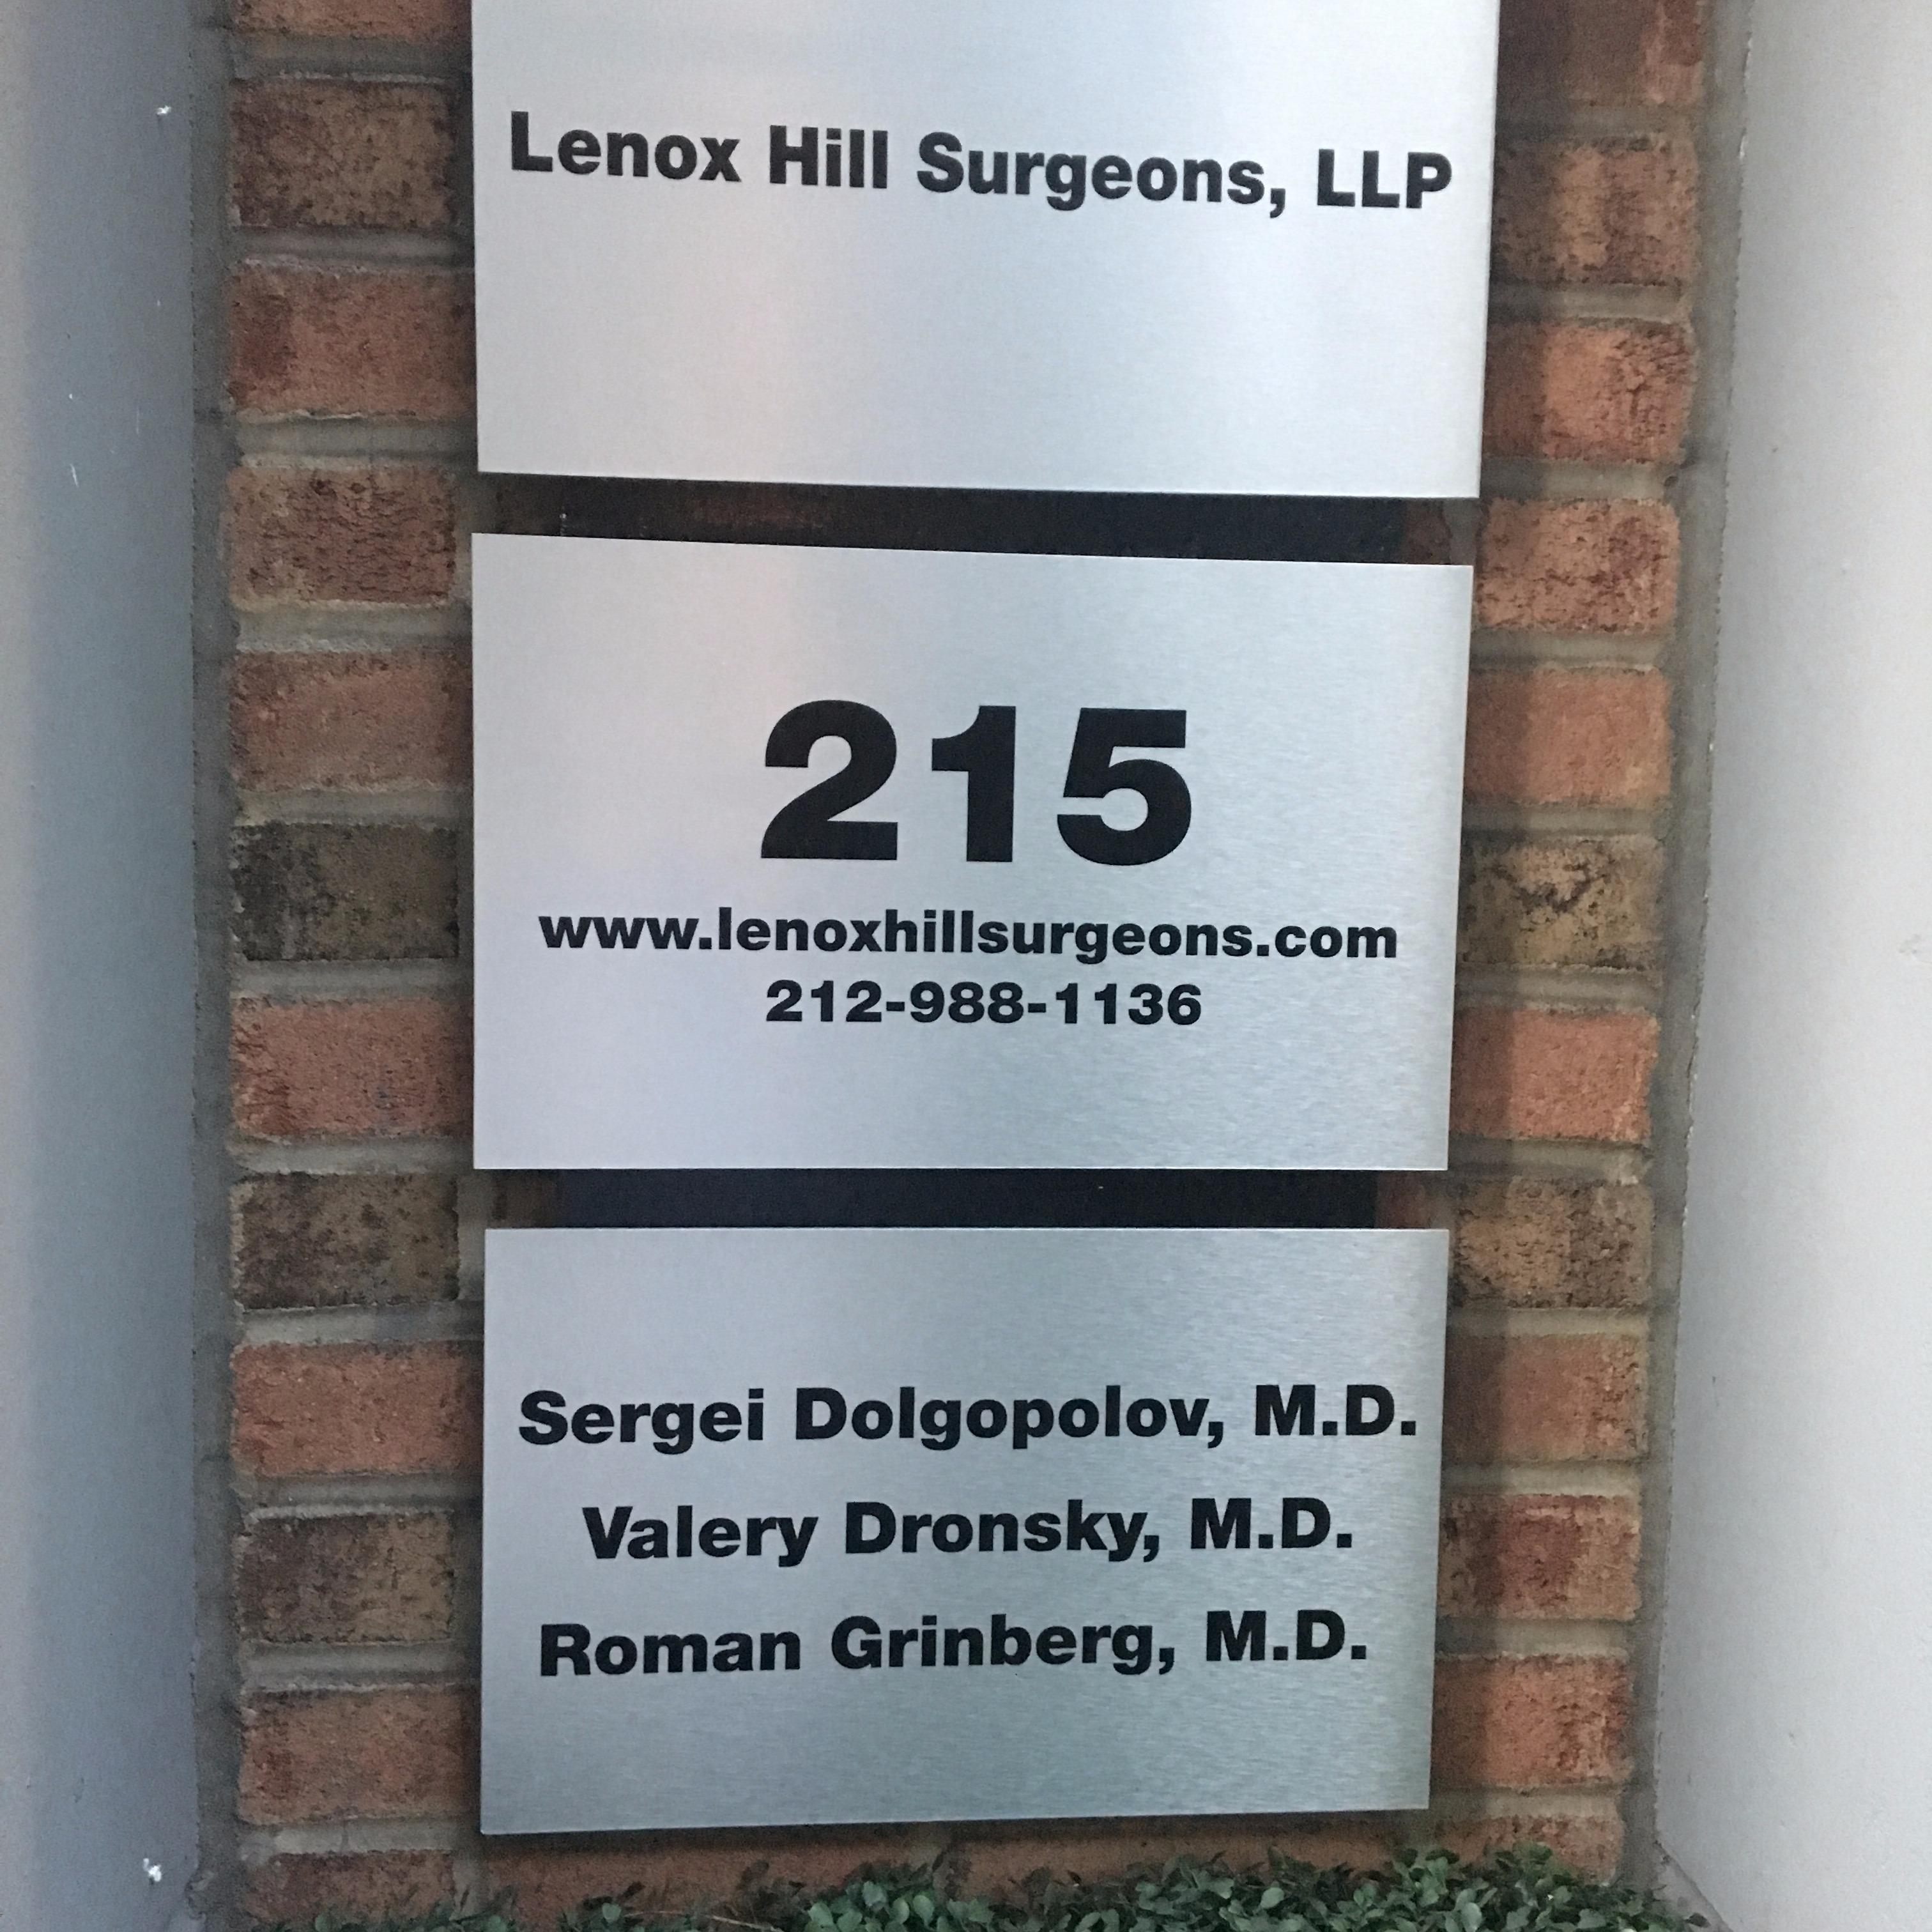 Valery Dronsky MD, FACS @ Lenox Hill Surgeons, LLP